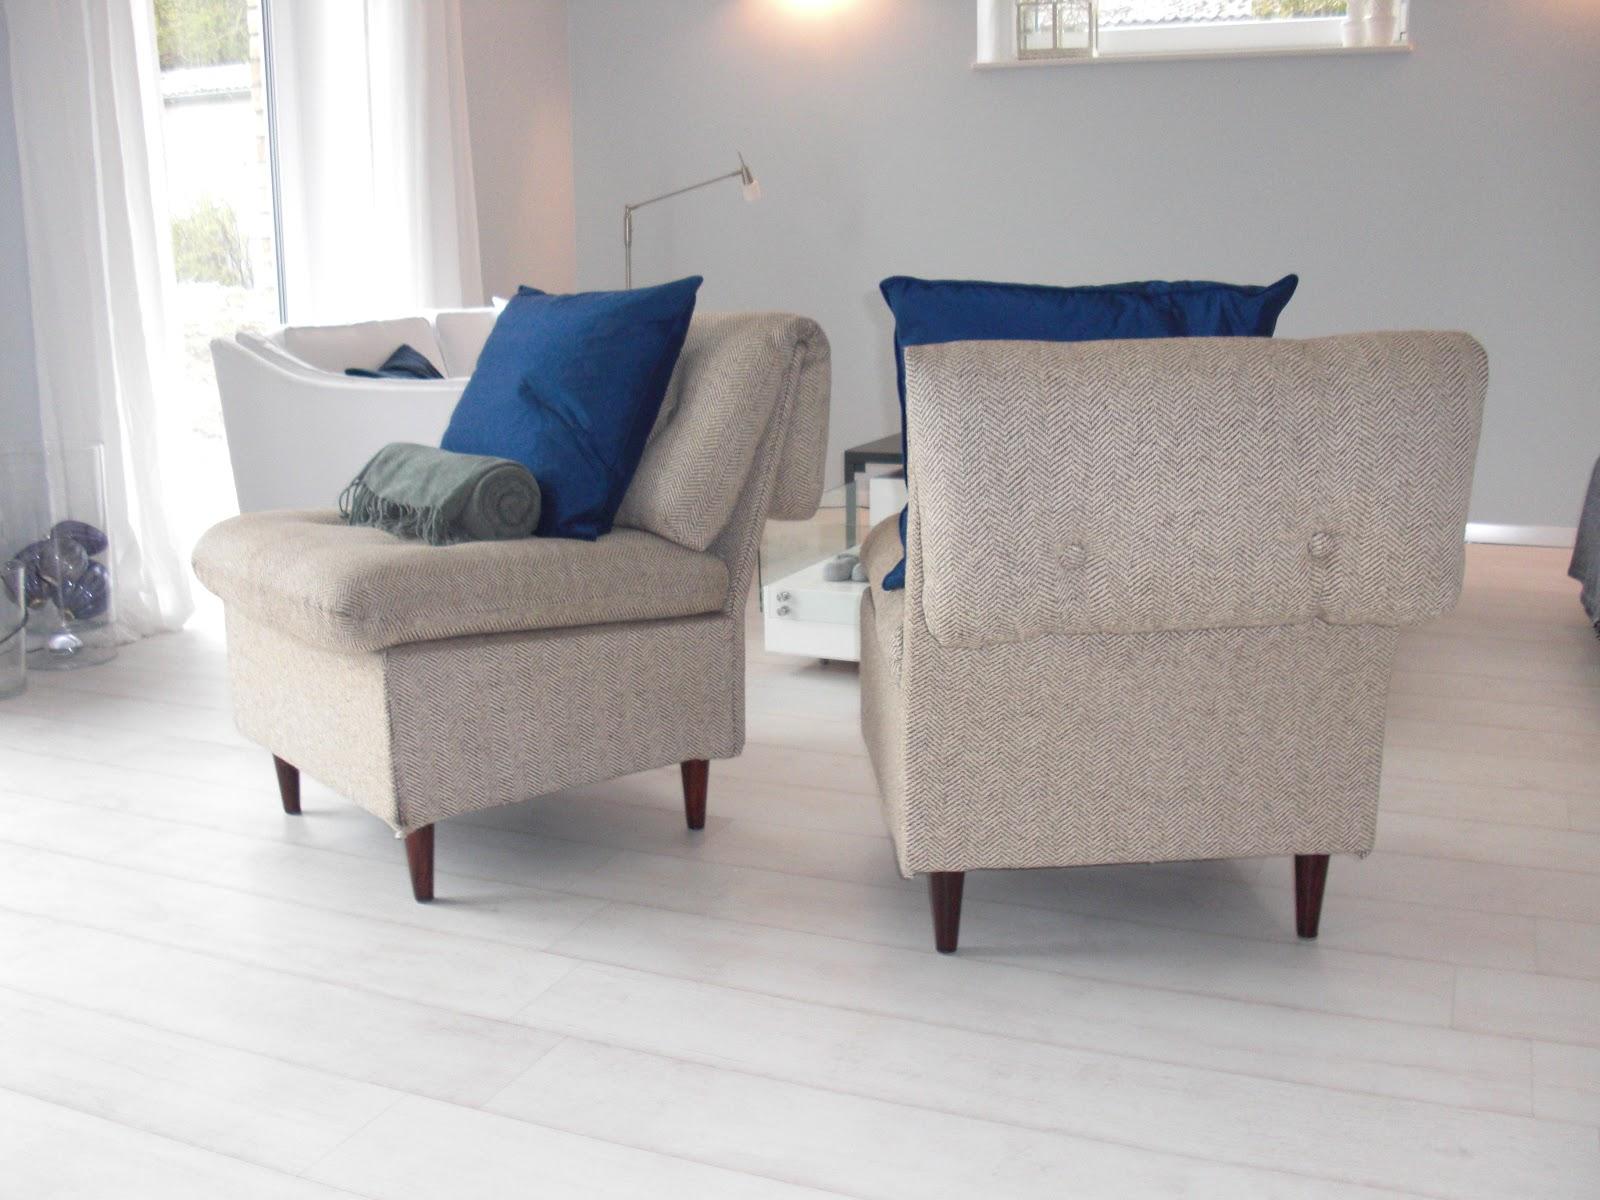 heim elich neue sessel. Black Bedroom Furniture Sets. Home Design Ideas